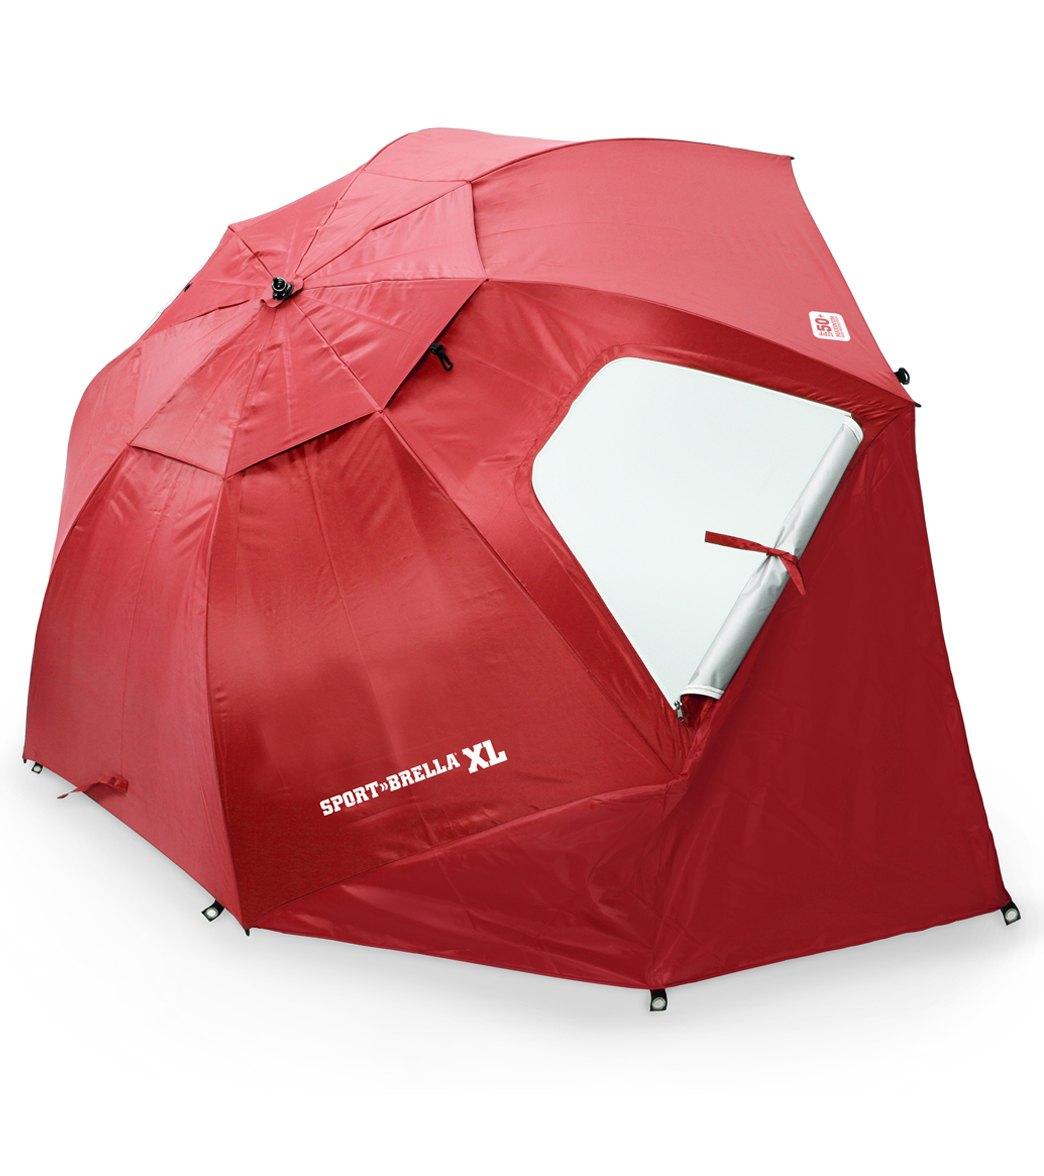 sc 1 st  SwimOutlet.com & Sport-Brella XL Shelter Beach Tent at SwimOutlet.com - Free Shipping